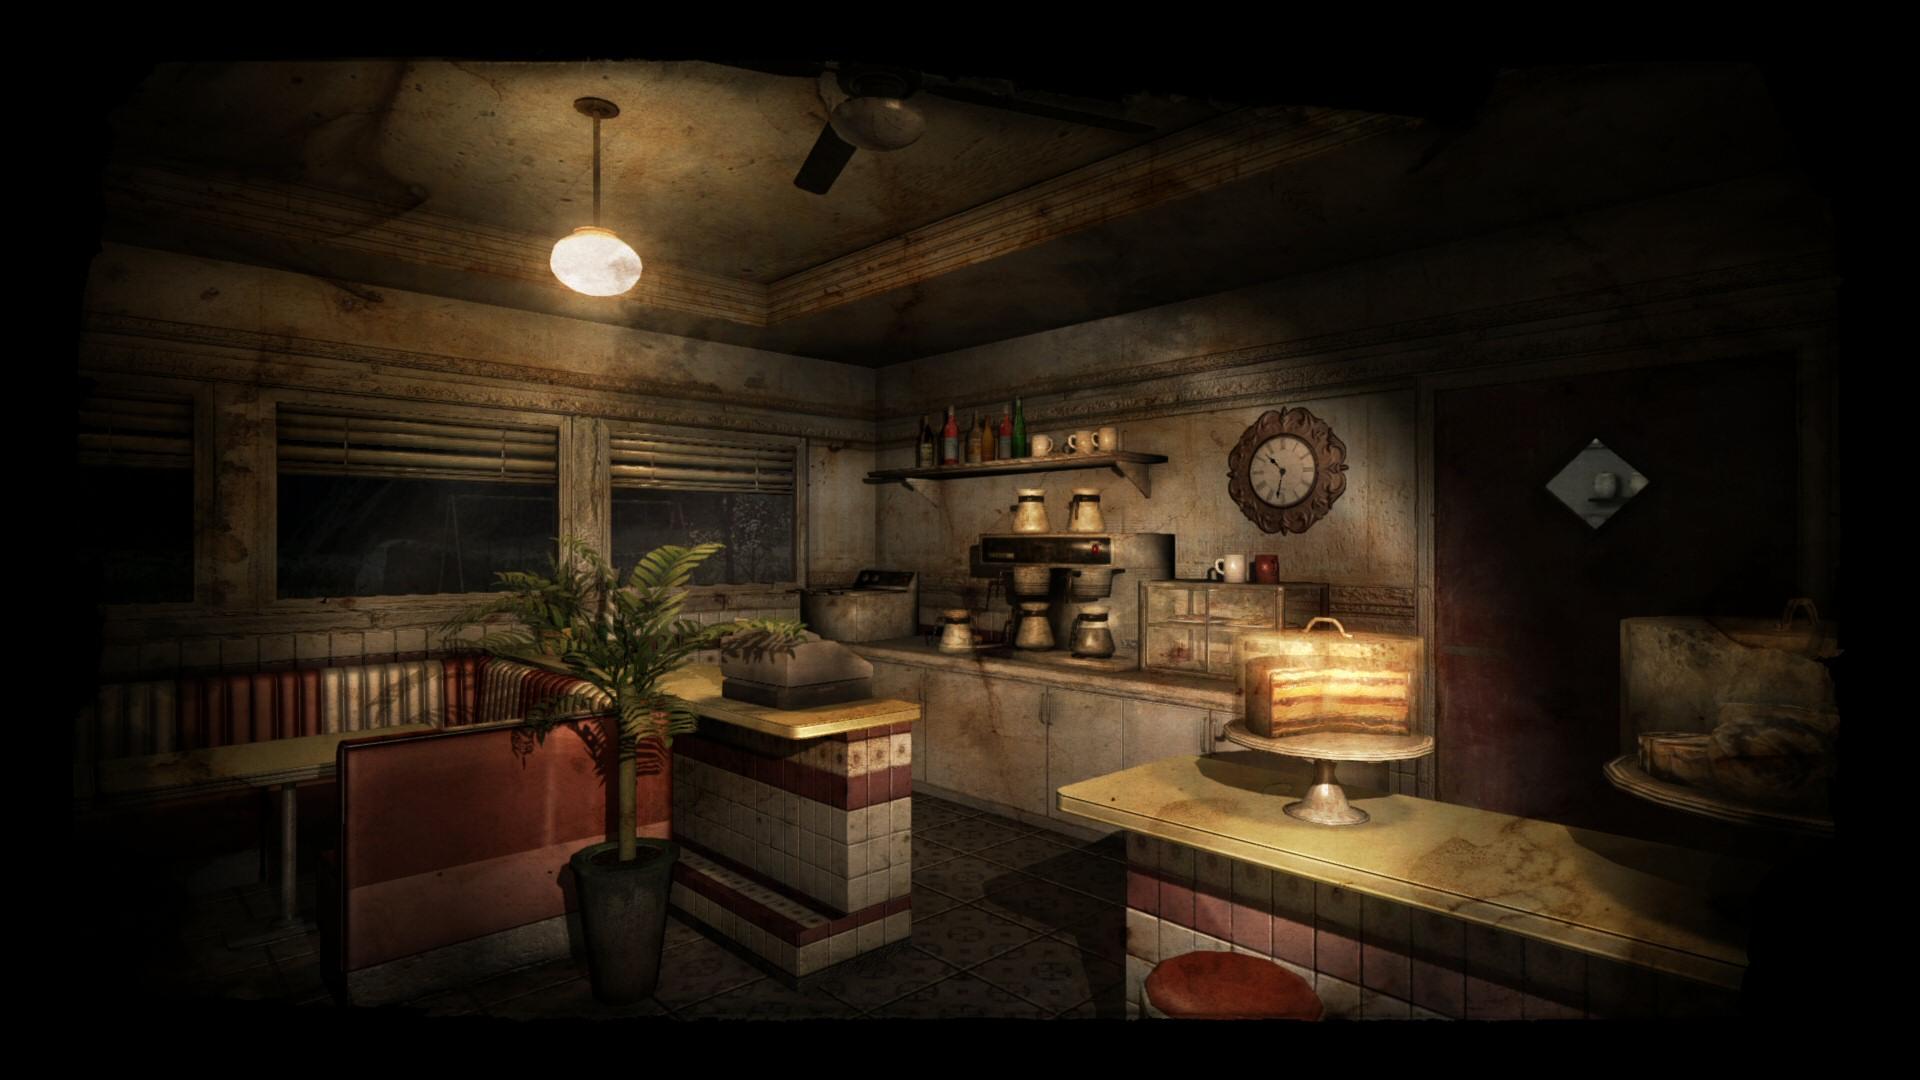 joes-diner-review-screenshot-3